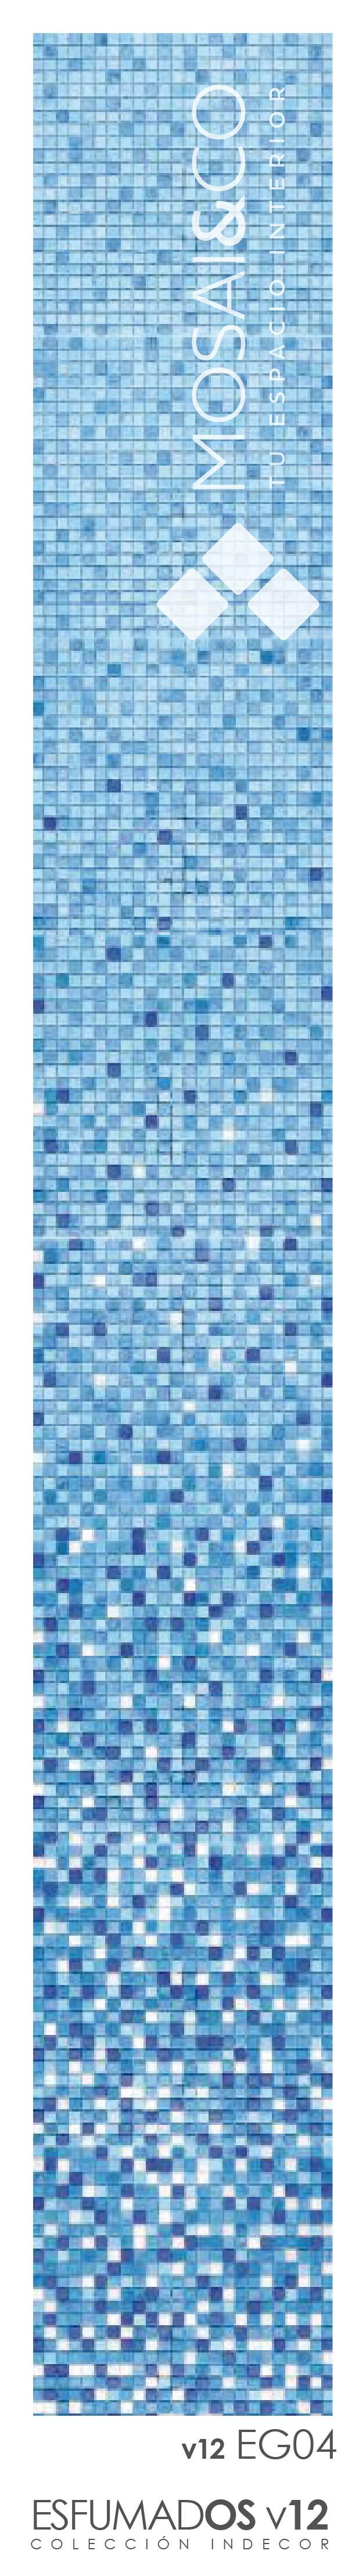 Esfumados-mosaico-v12-eg04-mosaiandco